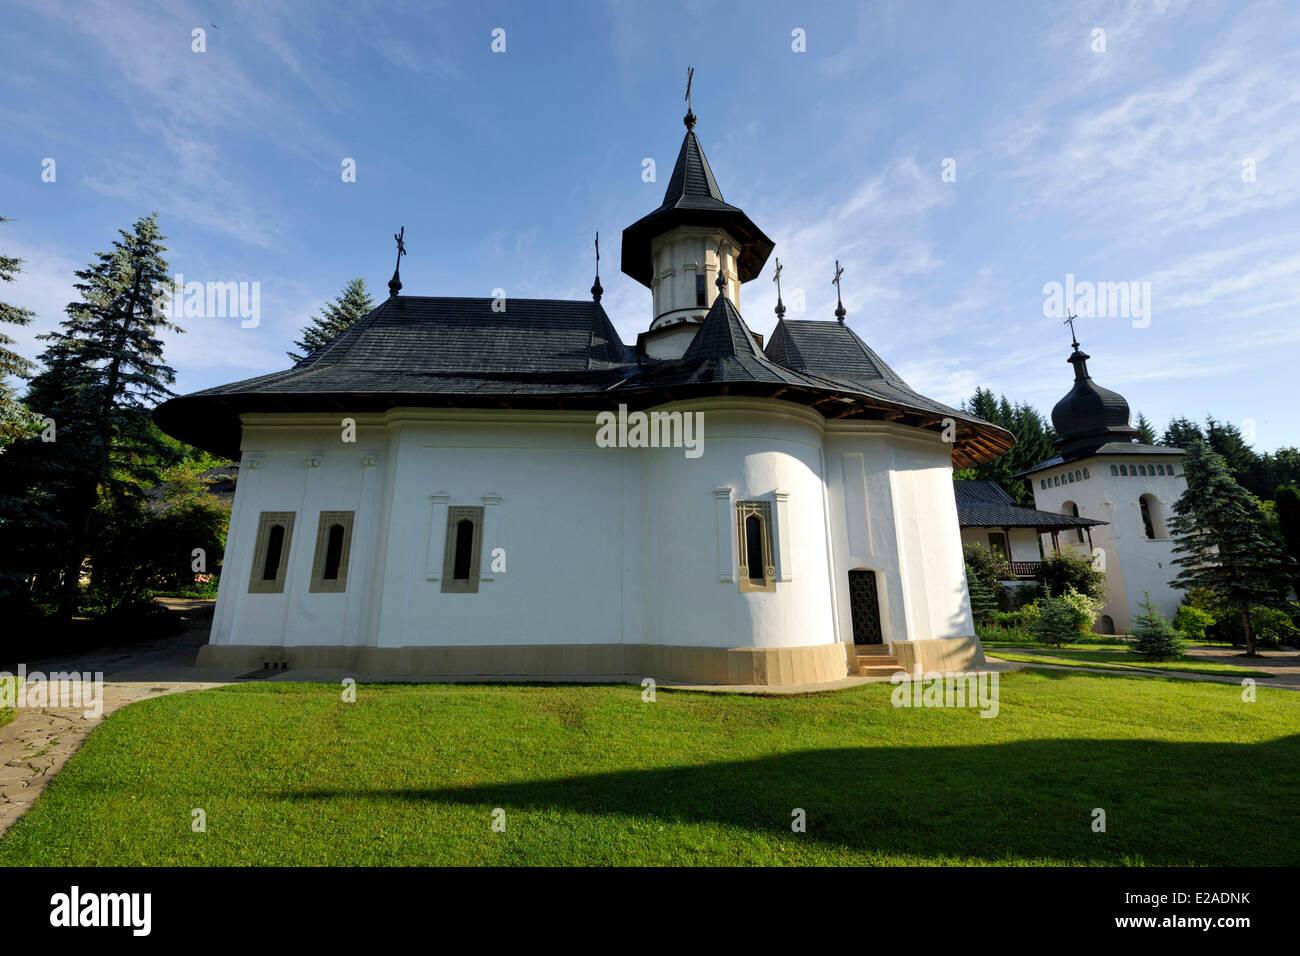 Romania, Bukovina Region, Neamt monasteries, Sihastria monastery - Stock Image